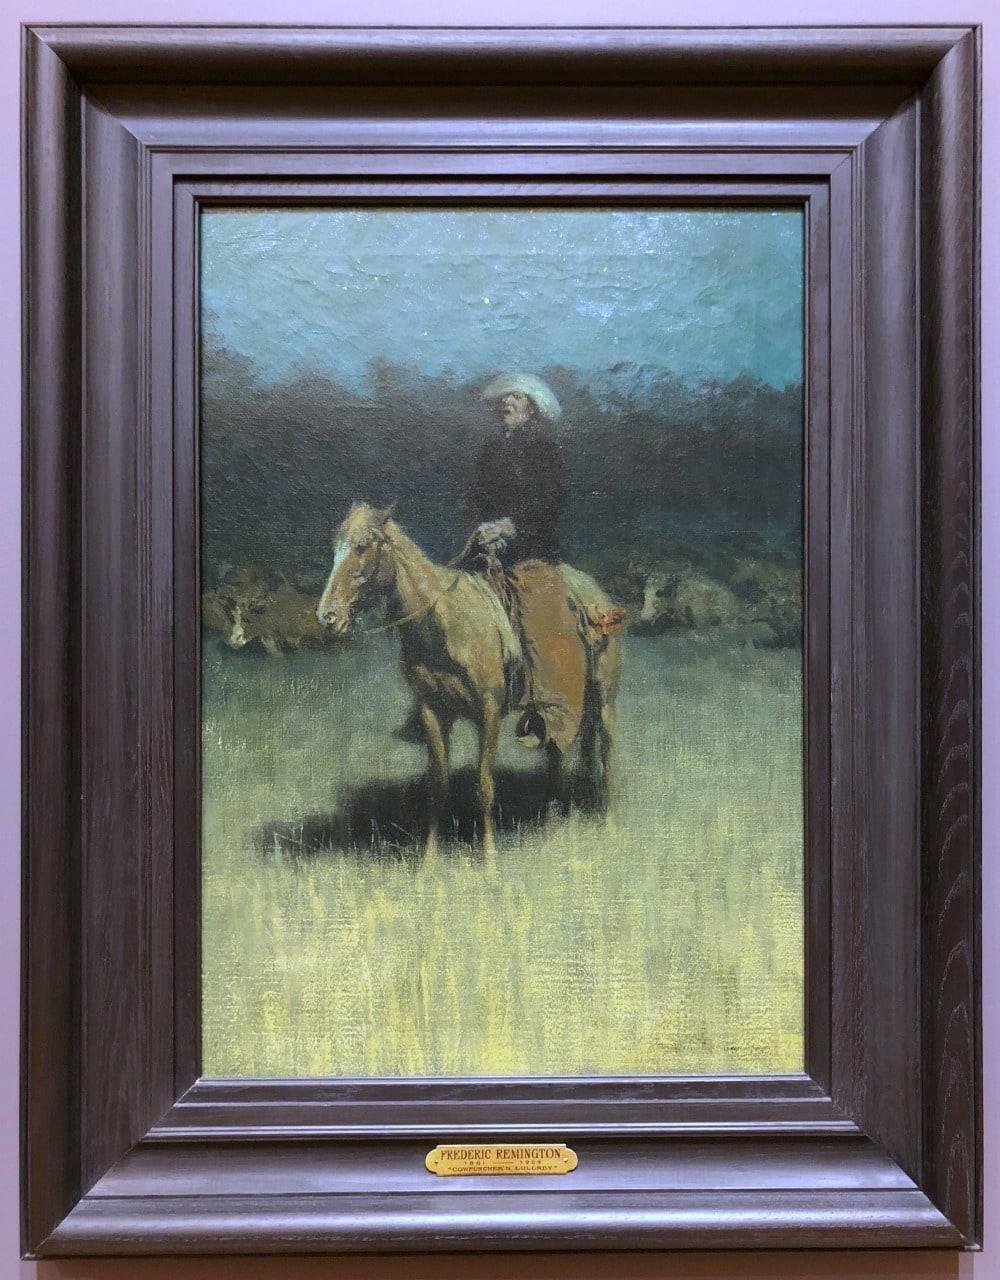 Art in Bentonville, Arkansas - Crystal Bridges Museum Fredric Remington